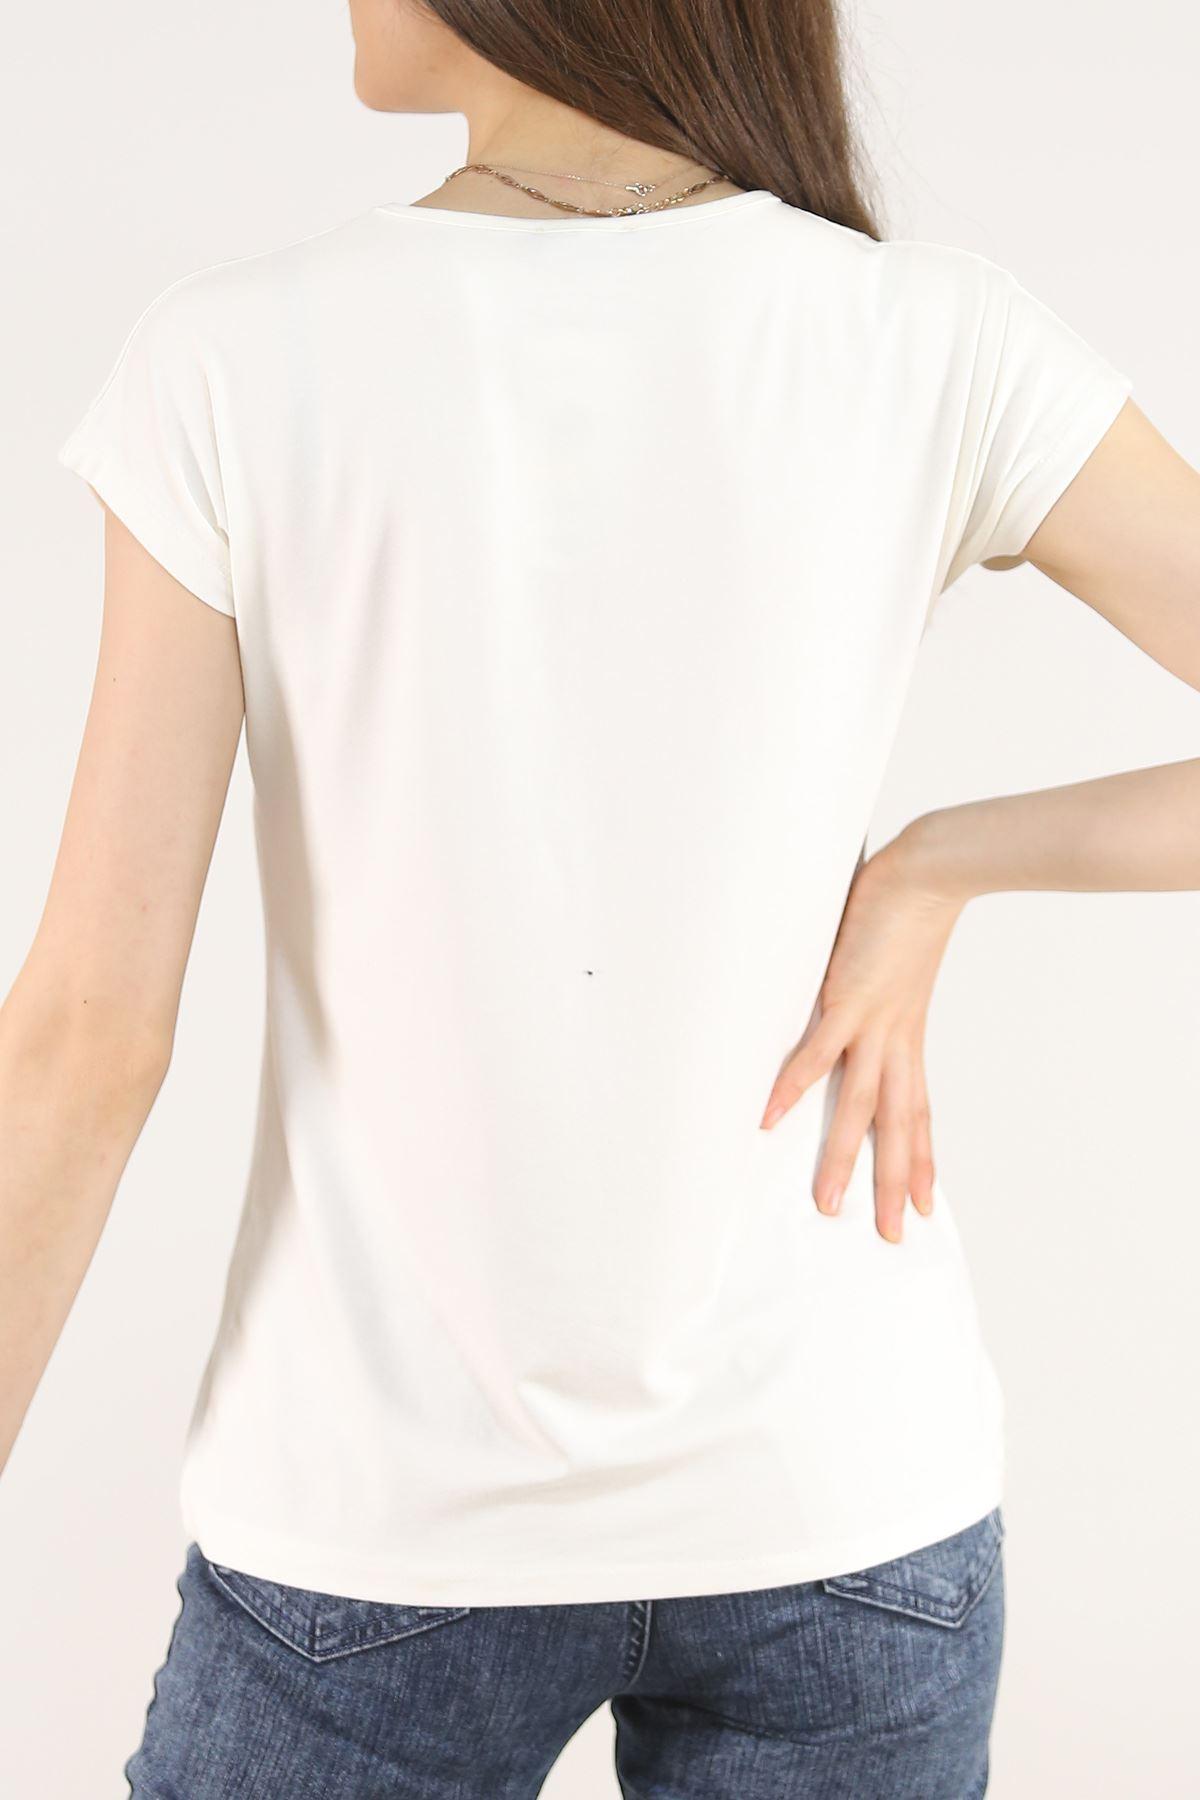 Pullu Tişört Ekru - 5027.139.